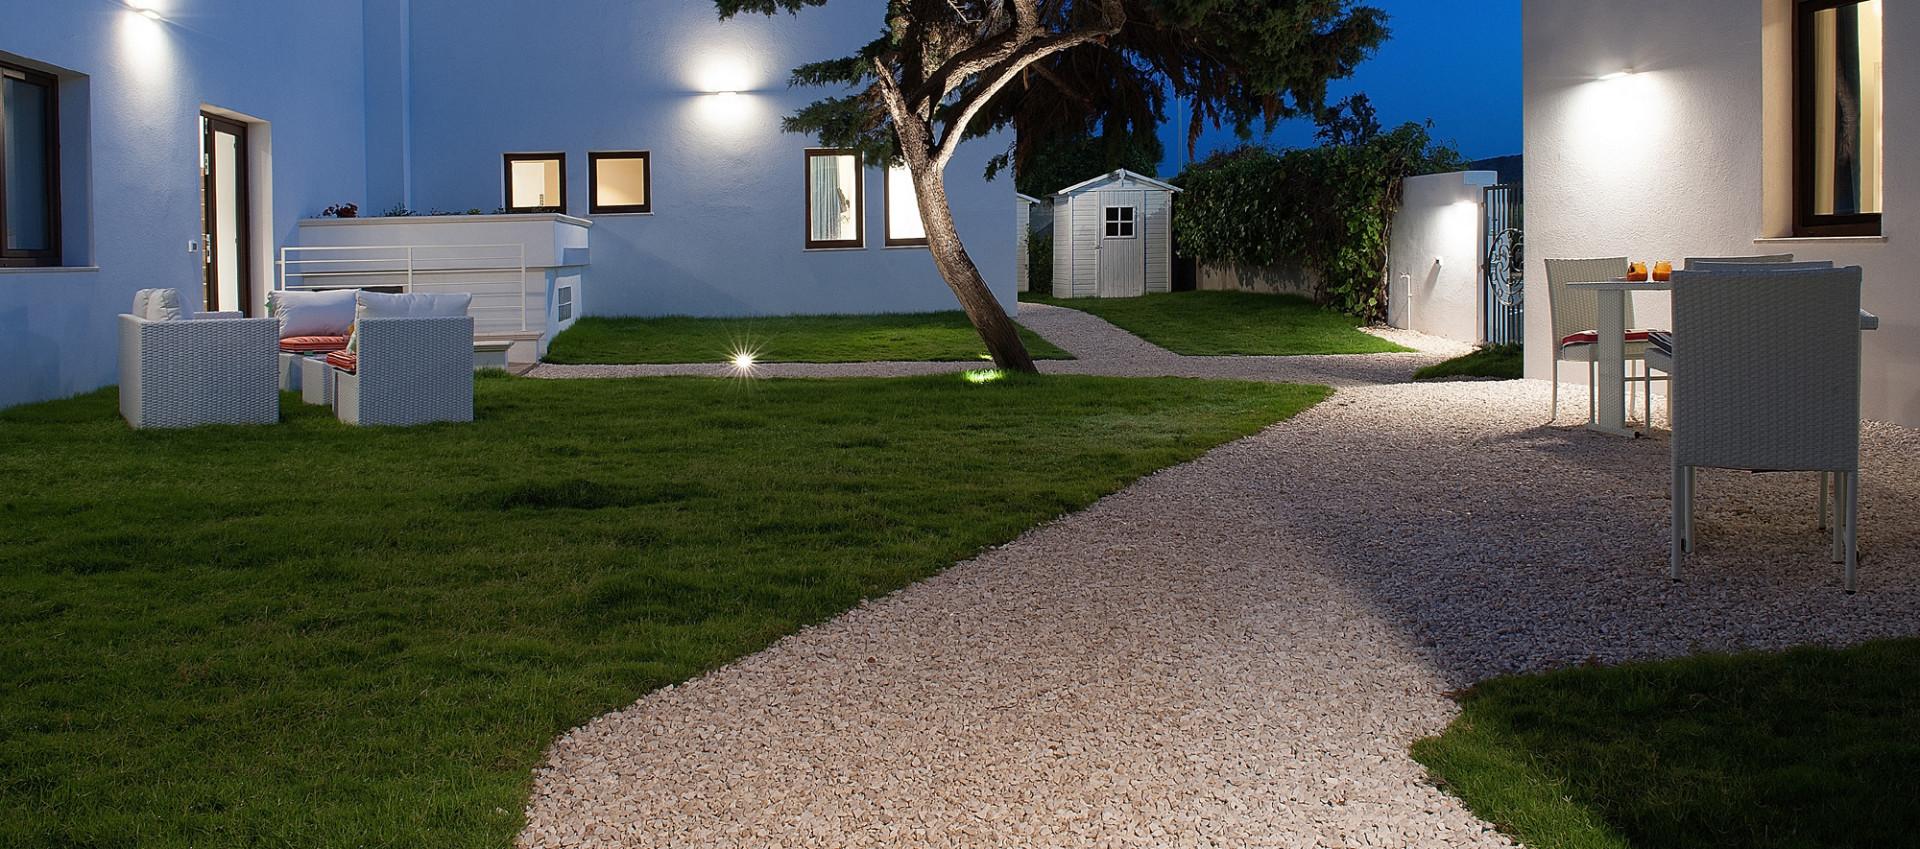 Giardino moderno lampioncino da giardino moderno in - Piccoli giardini moderni ...